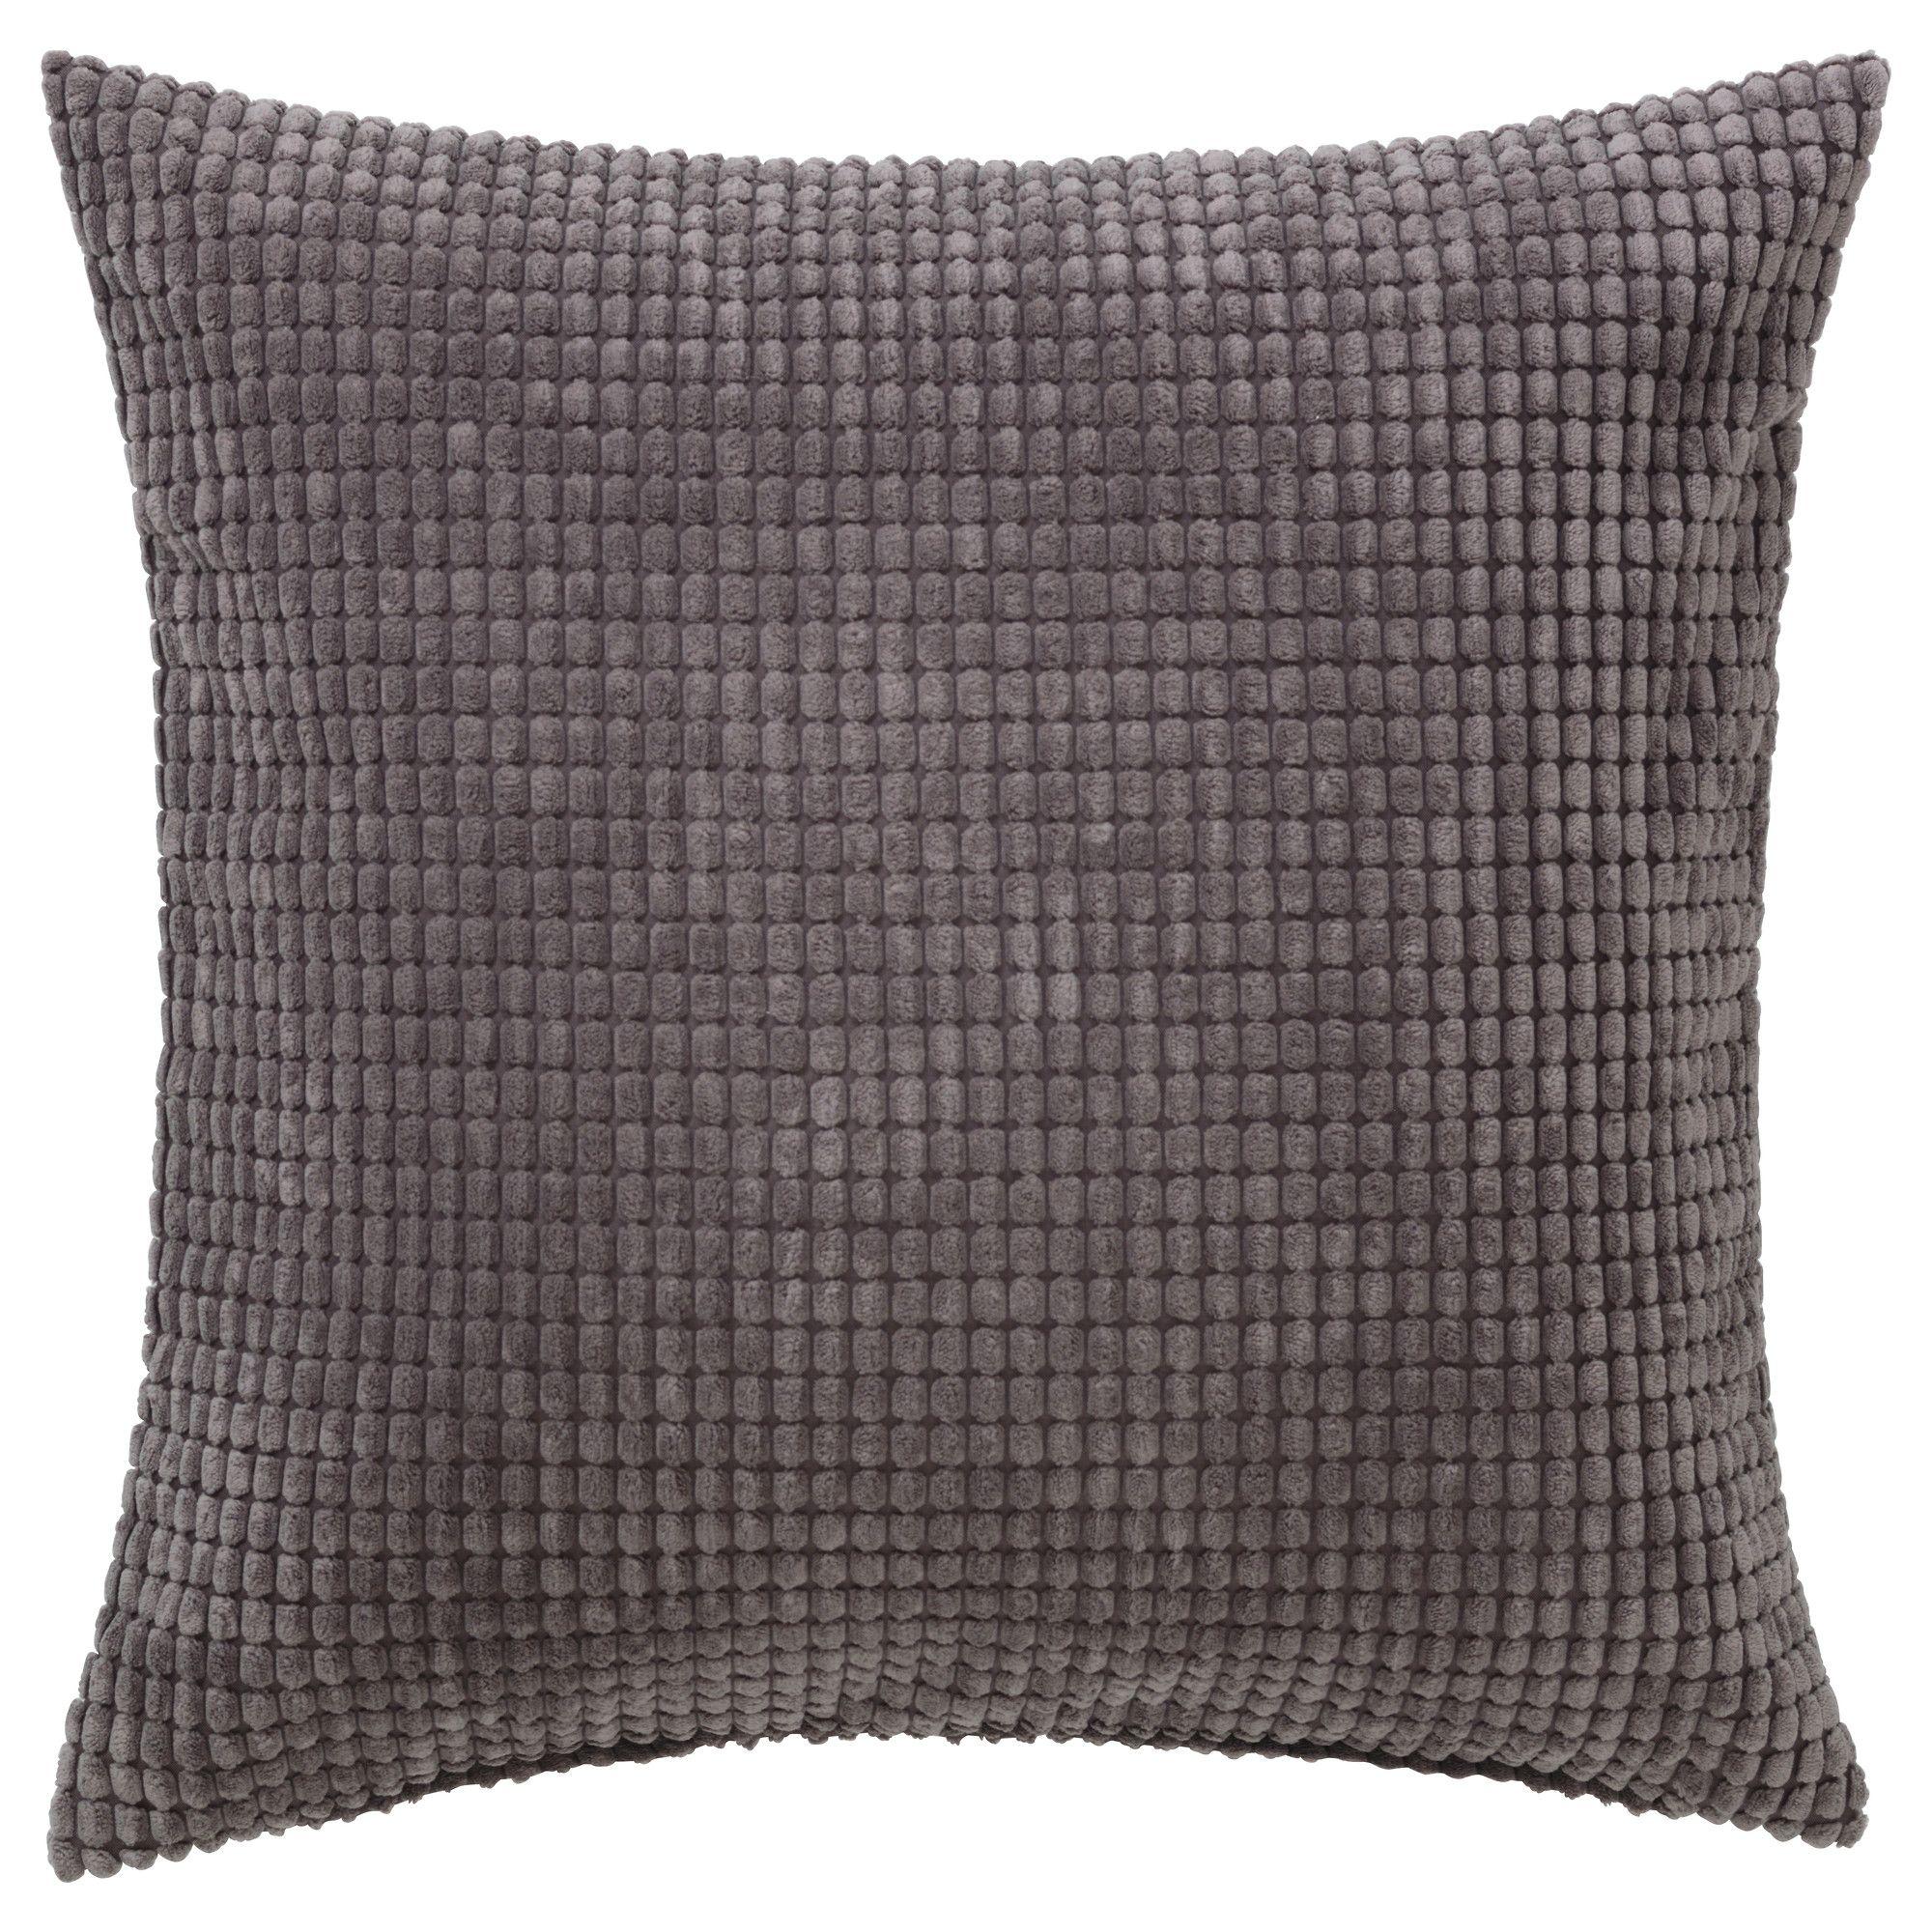 gullklocka housse de coussin gris ma chambre pinterest coussin ikea housse de coussin et. Black Bedroom Furniture Sets. Home Design Ideas